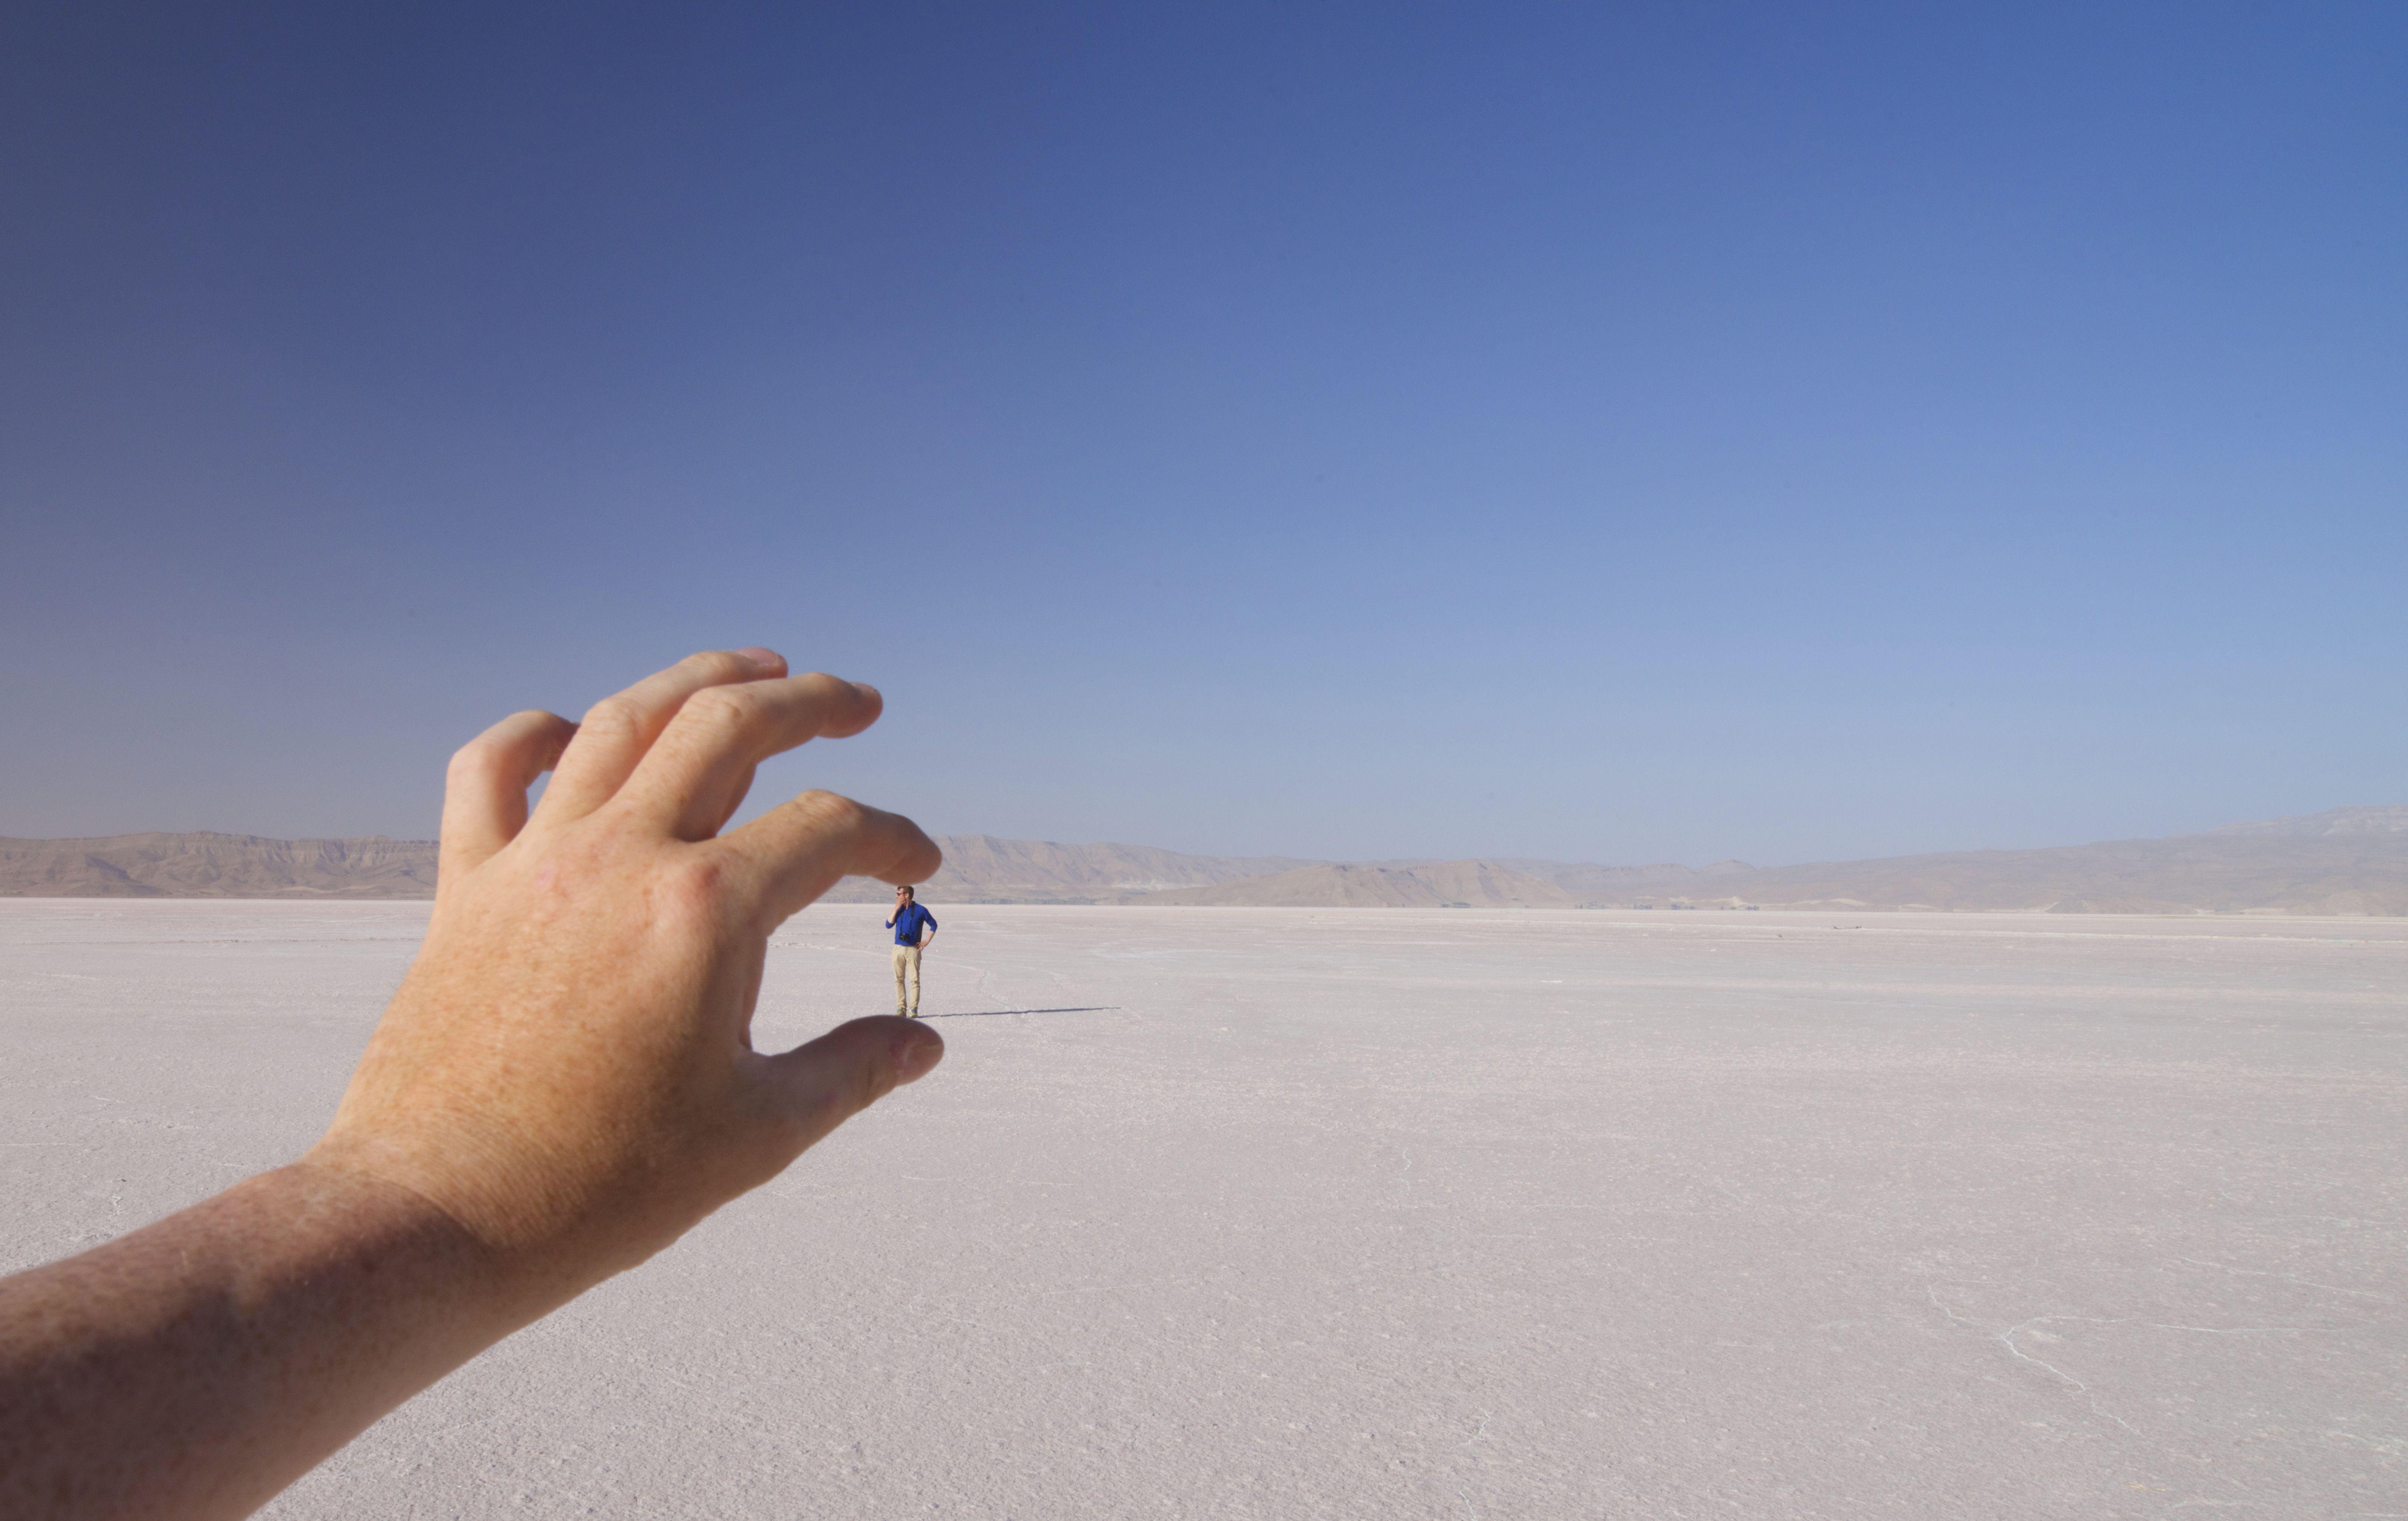 'Tiny tourist!' White salt desert backdrop. Maharlu Lake is a seasonal salt lake, Sarvestan County, near Shiraz, Iran